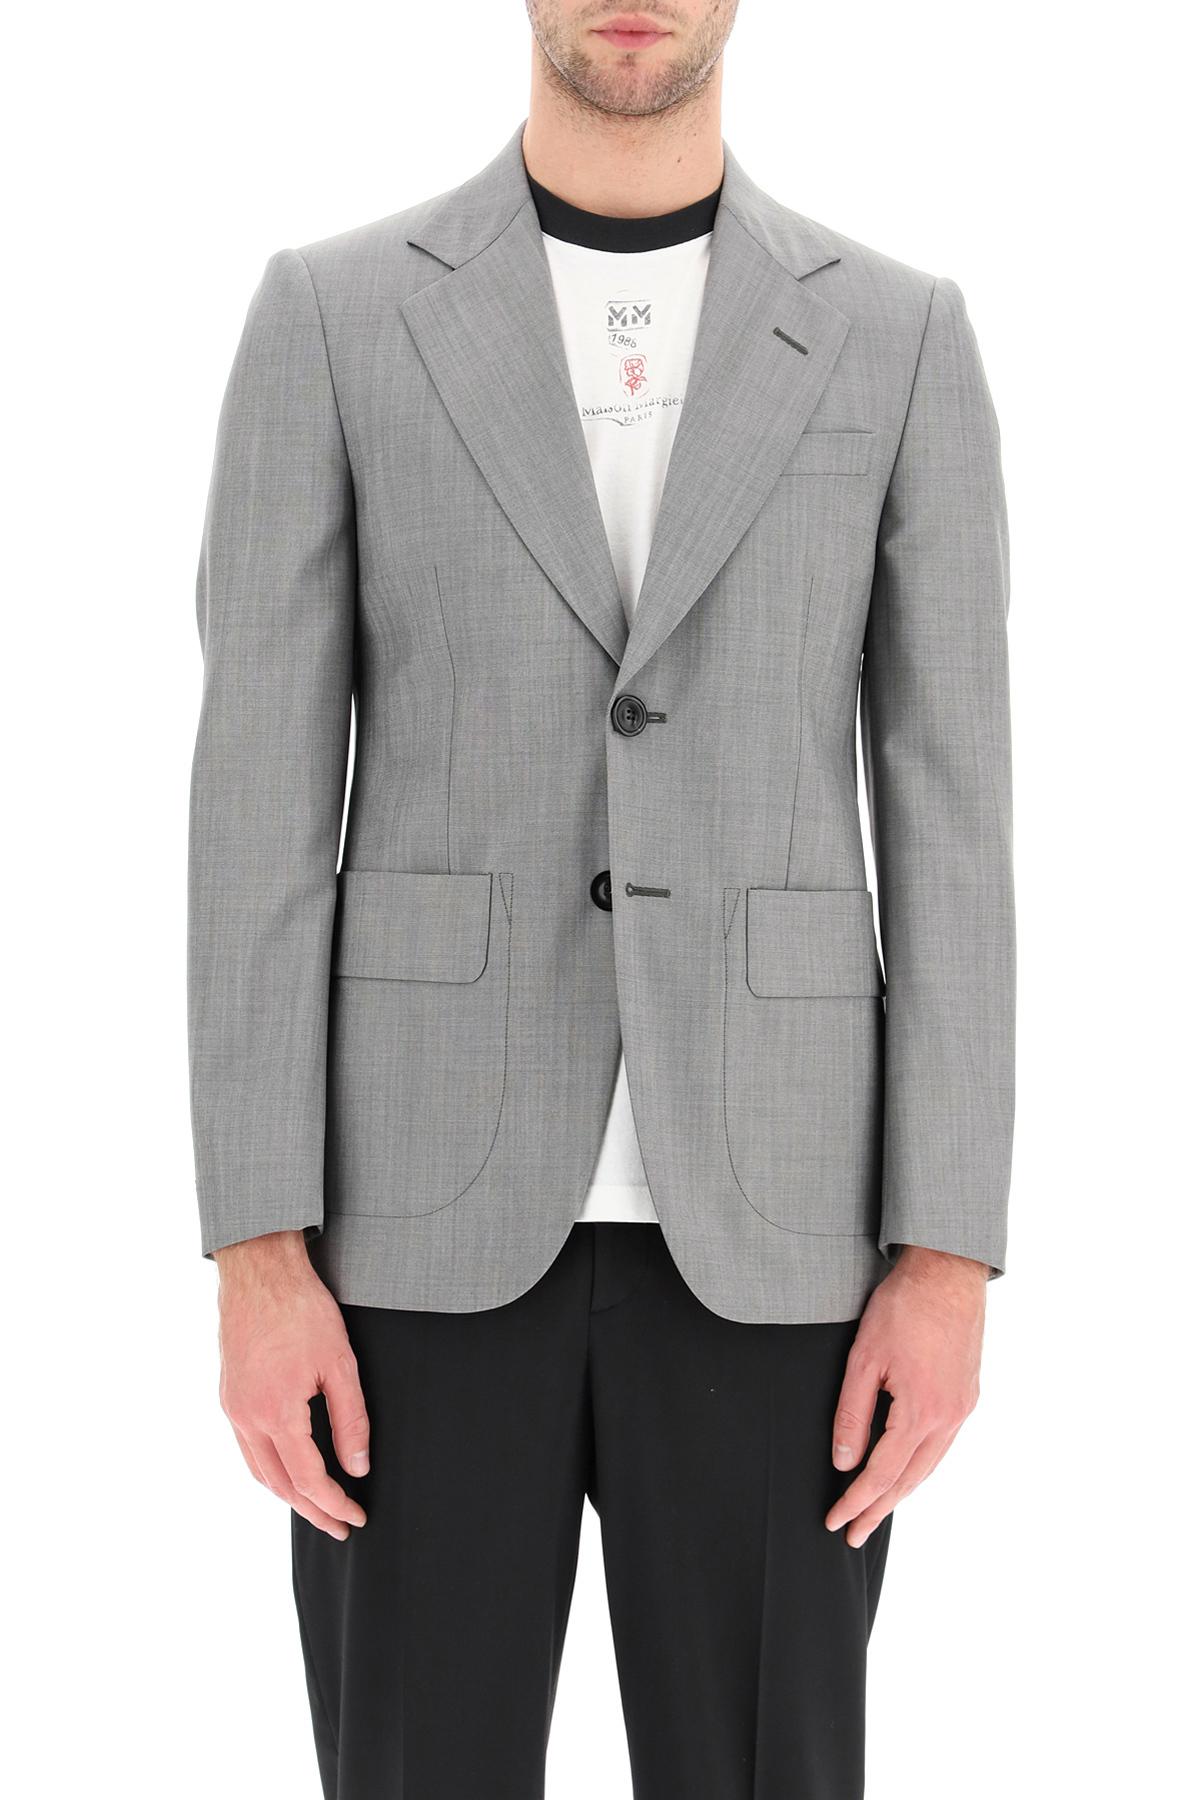 Maison margiela giacca classica lana mohair